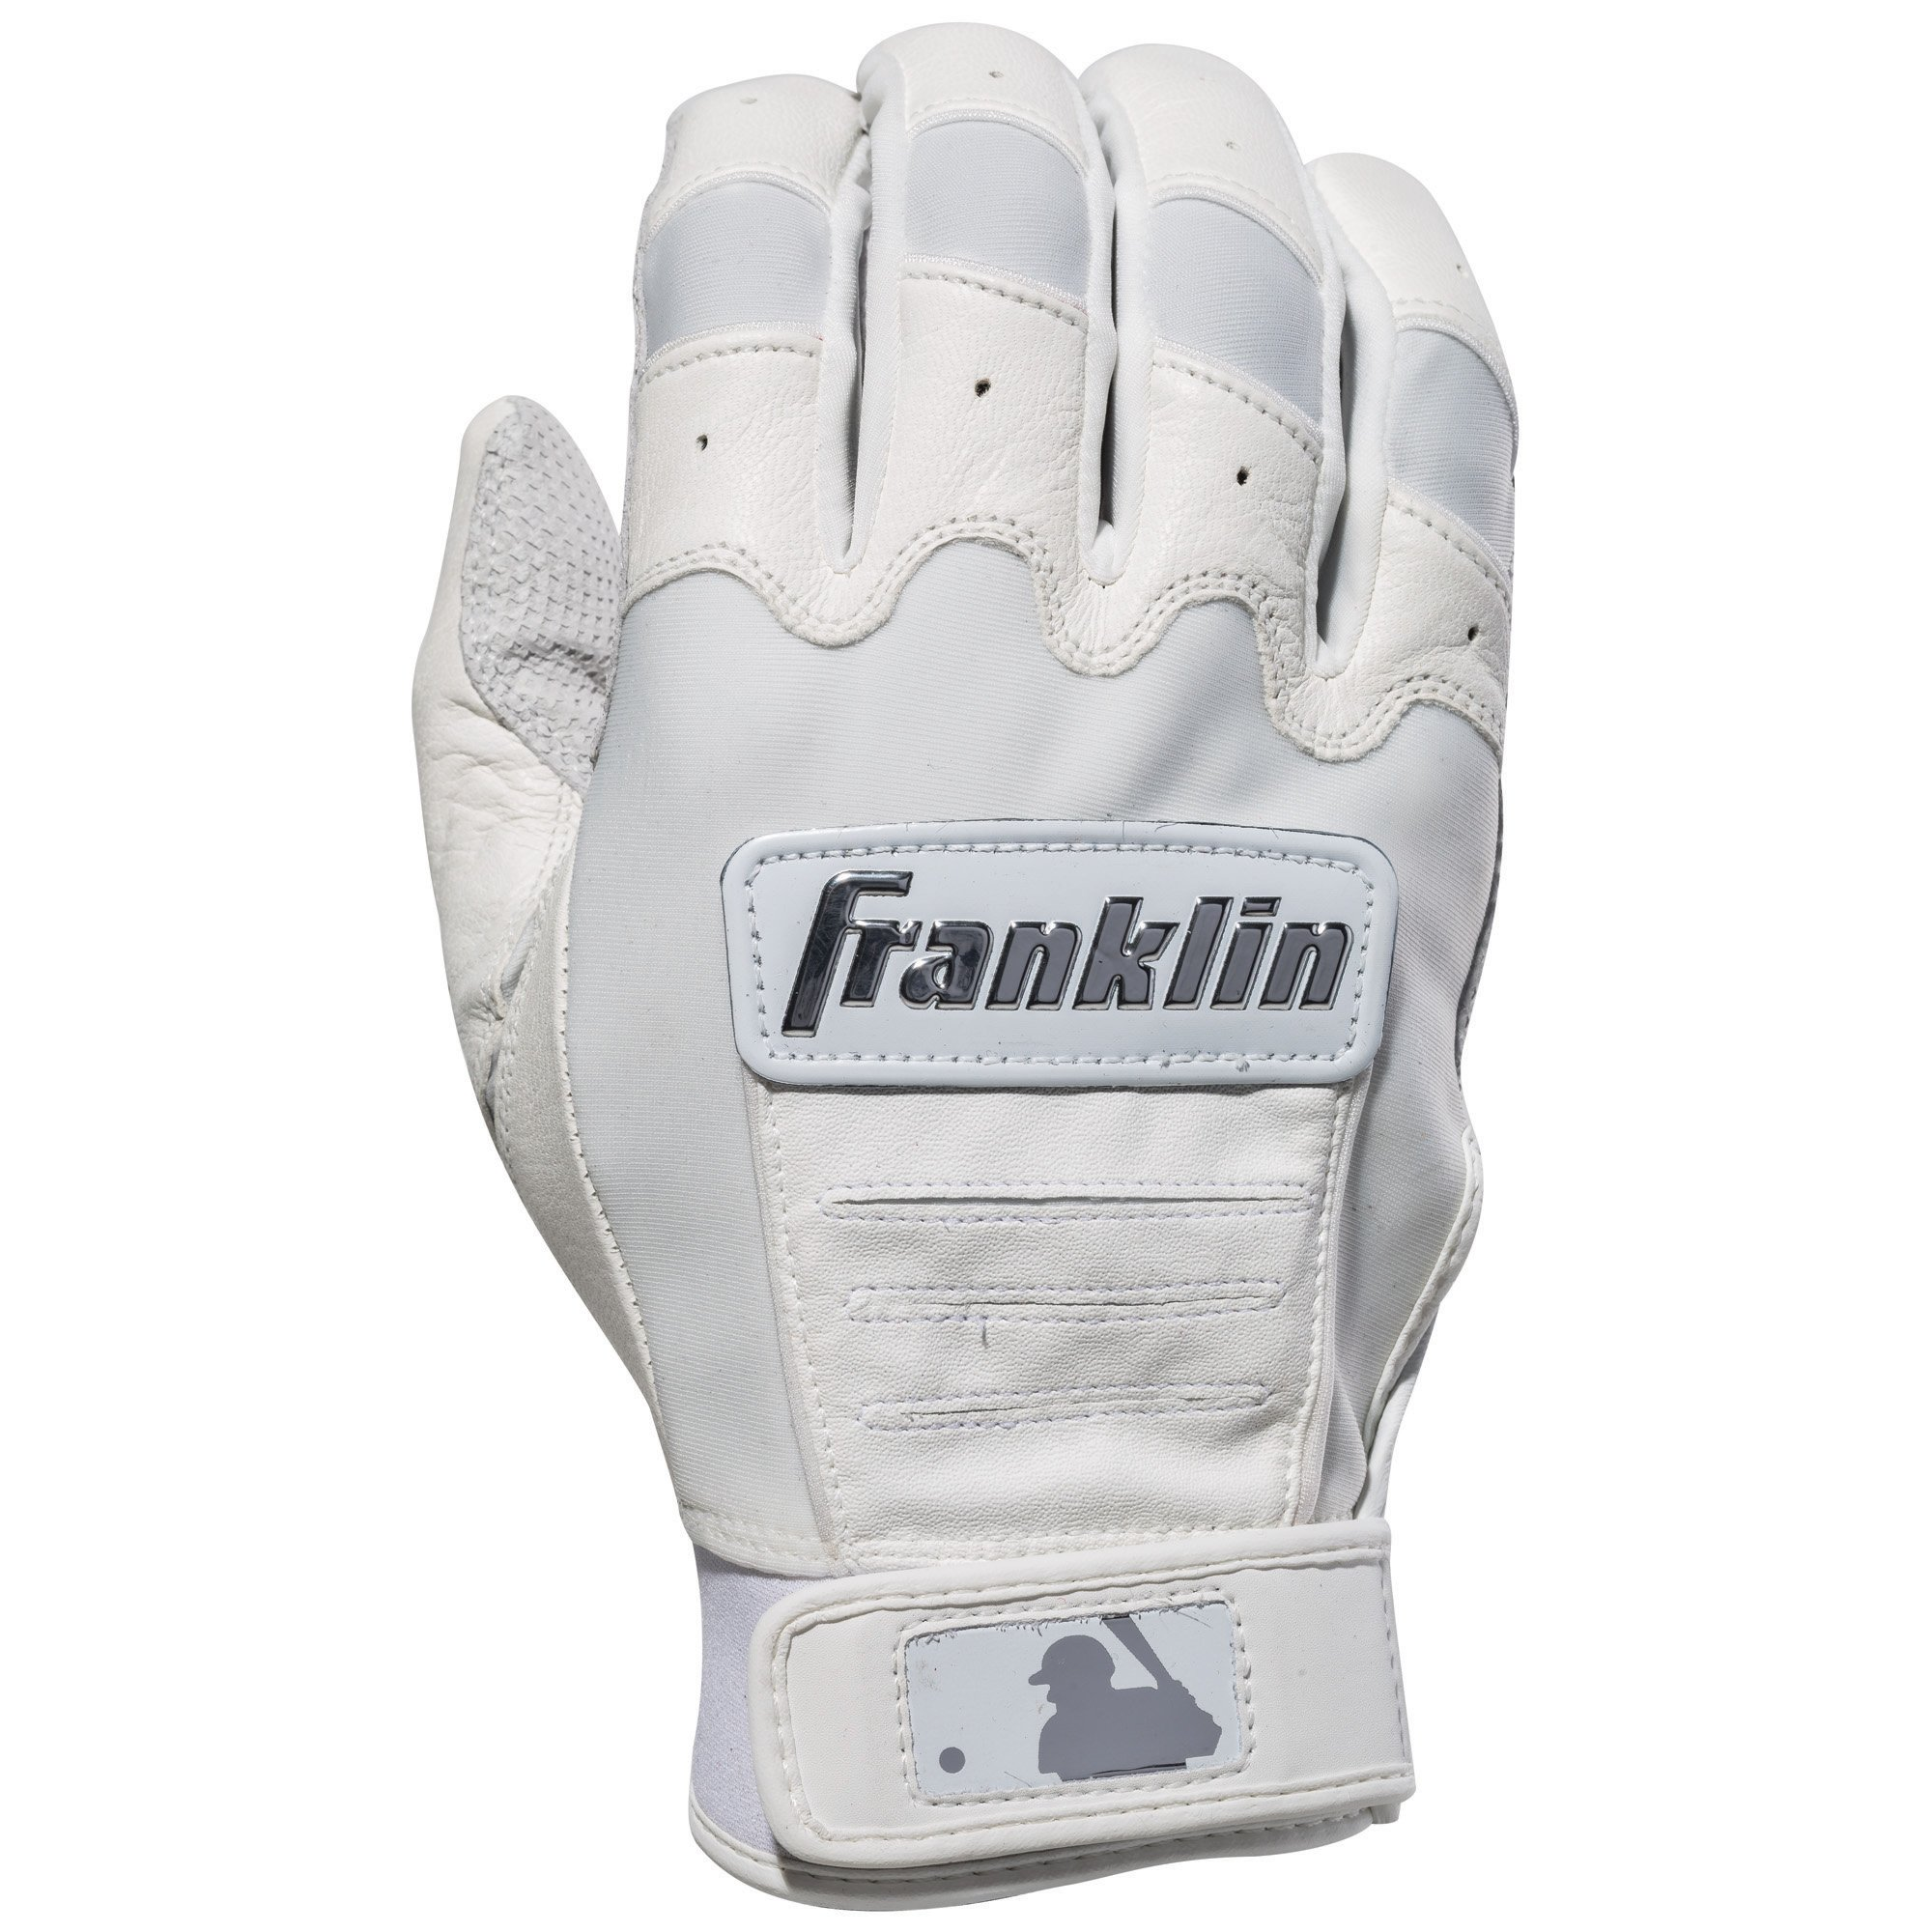 Franklin Sports CFX Pro Full Color Chrome Series Batting Gloves CFX Pro Full Color Chrome Batting Gloves, White, Adult Small by Franklin Sports (Image #2)